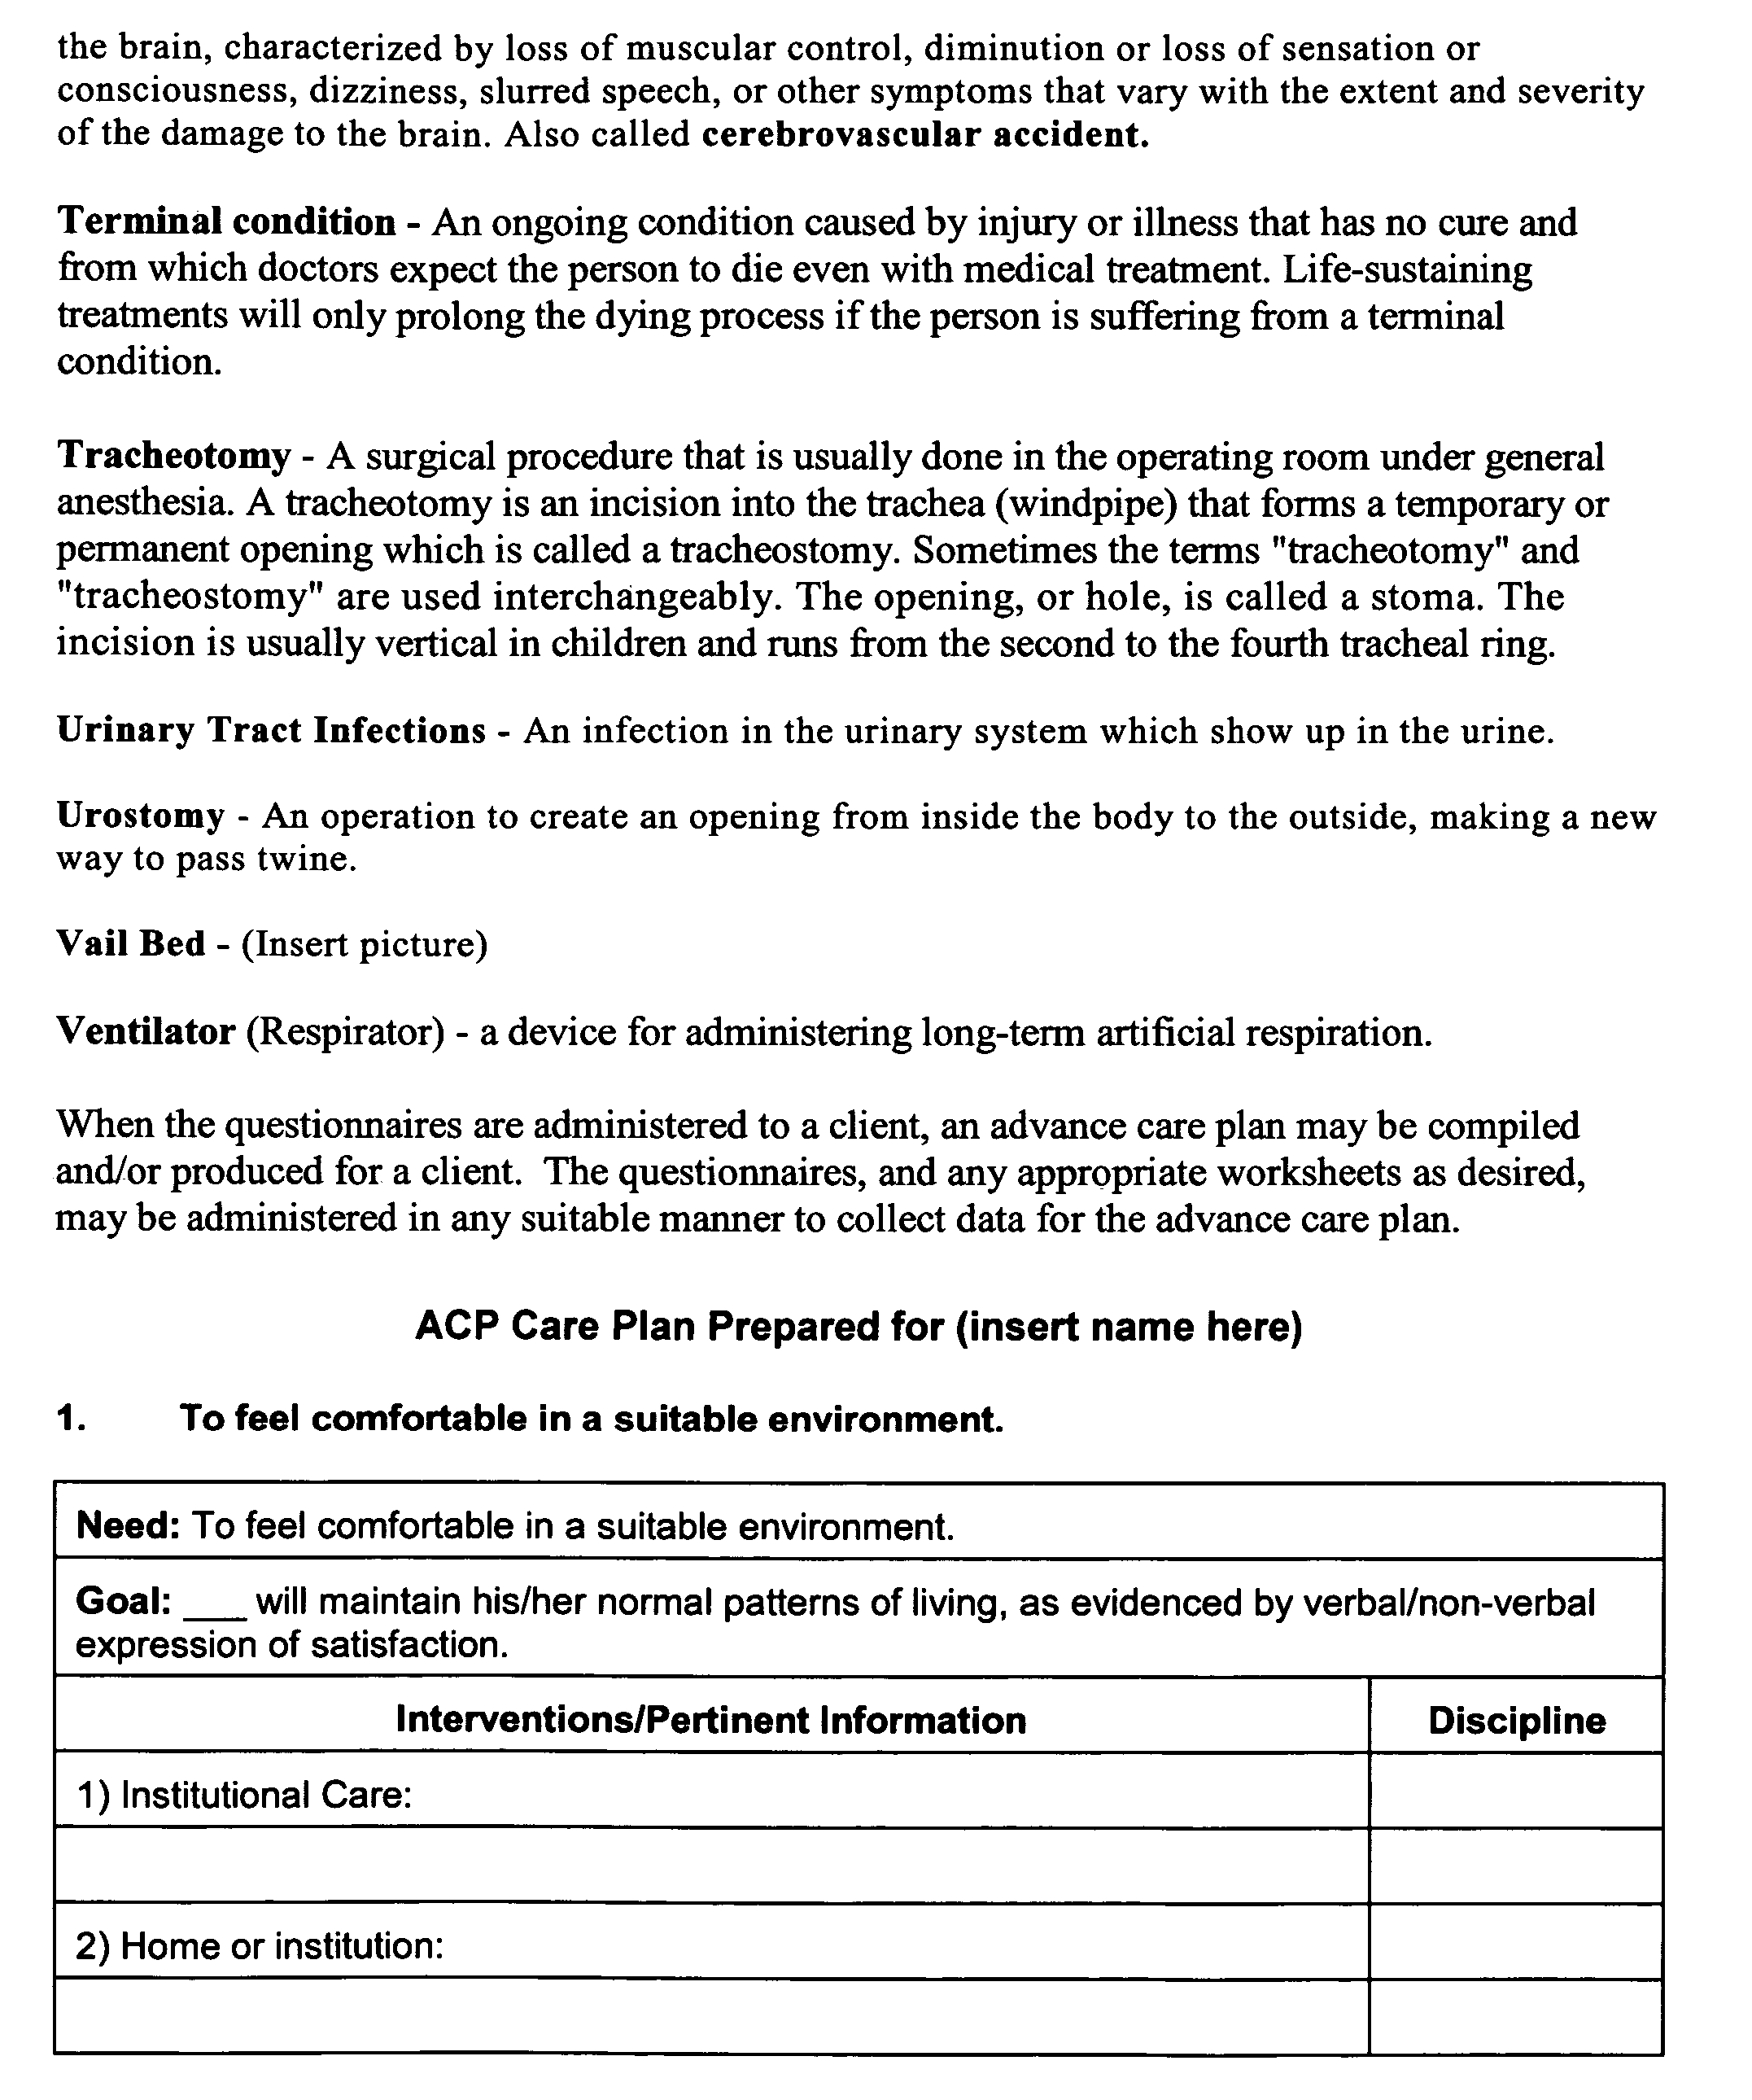 patent us20050202383 - advance care plan - google patents